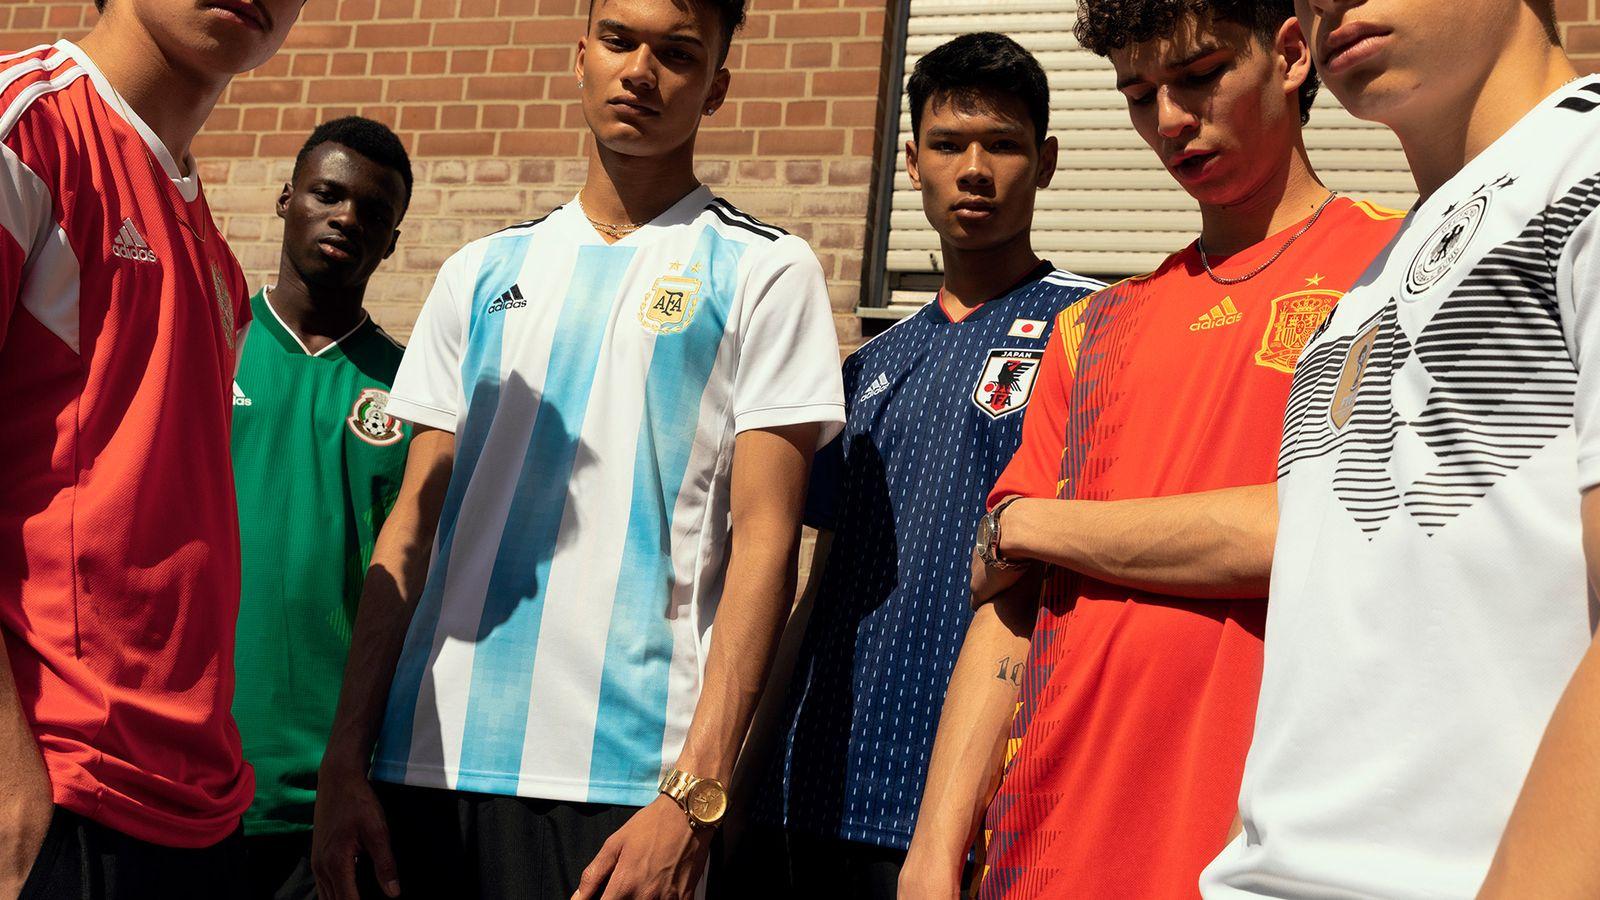 adidas football 2018 world cup jerseys full 2018 FIFA World Cup